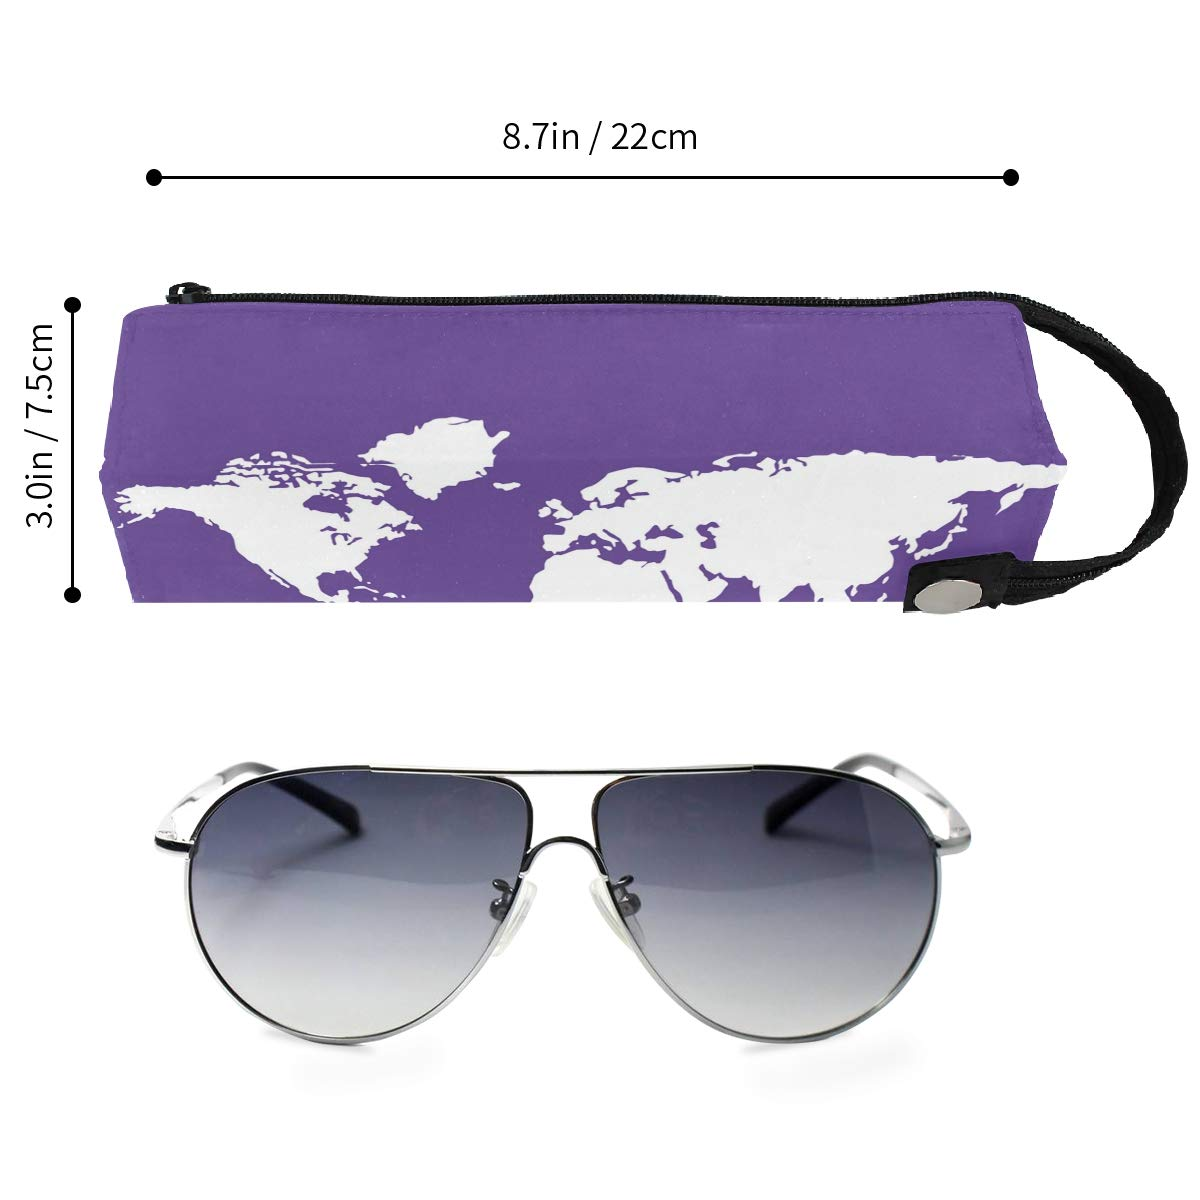 Glasses Case Purple World Maps Zipper Soft Sunglasses Ball Pen Bag Protective Pouch